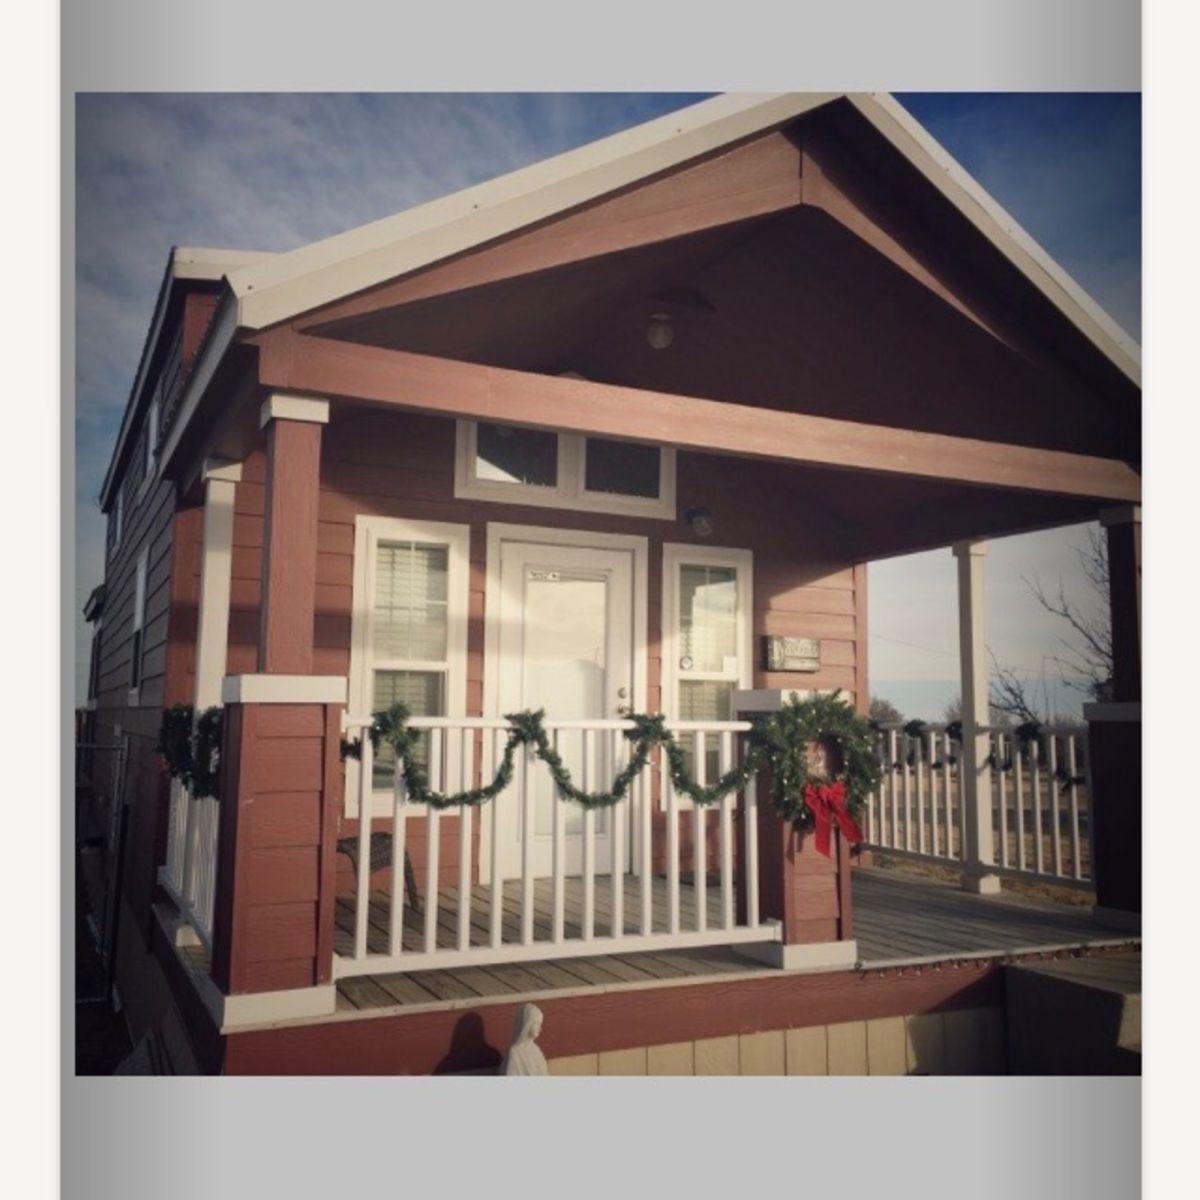 For Sale Amarillo Texas 79111 United States 49 500 Tiny Houses For Sale Tiny House Listings House Prices